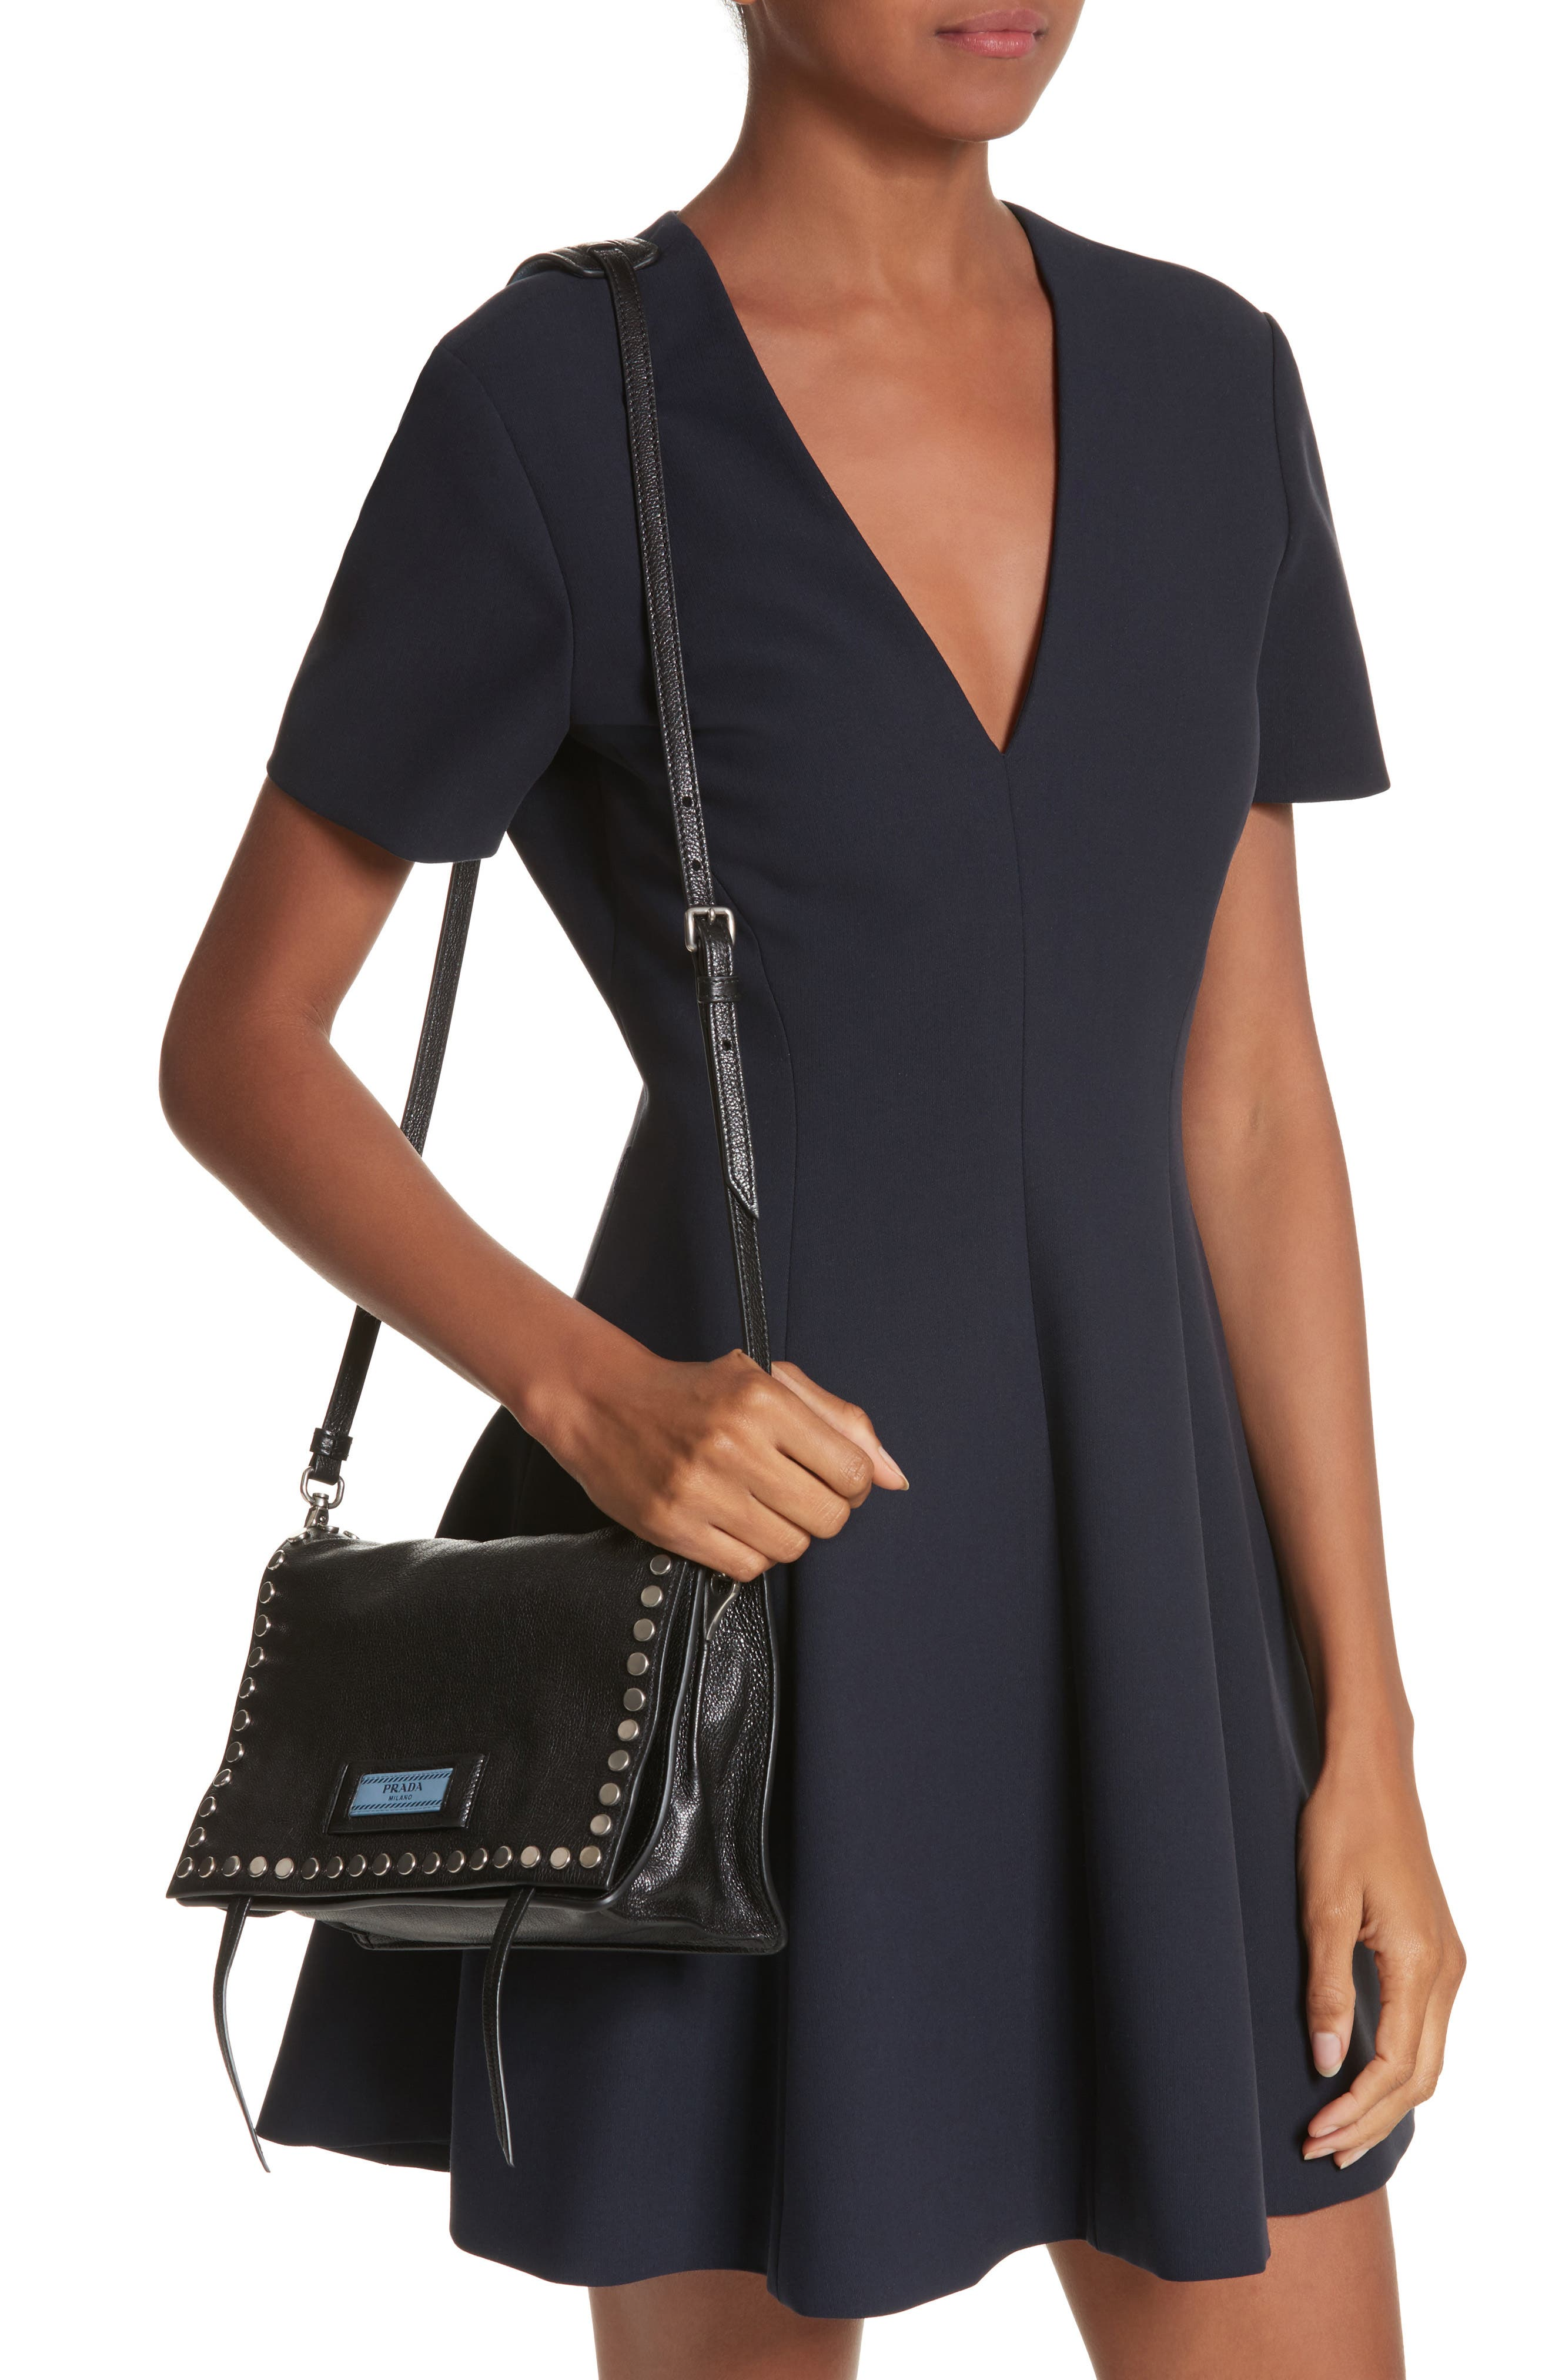 Small Stud Etiquette Shoulder Bag,                             Alternate thumbnail 2, color,                             NERO/ ASTRALE